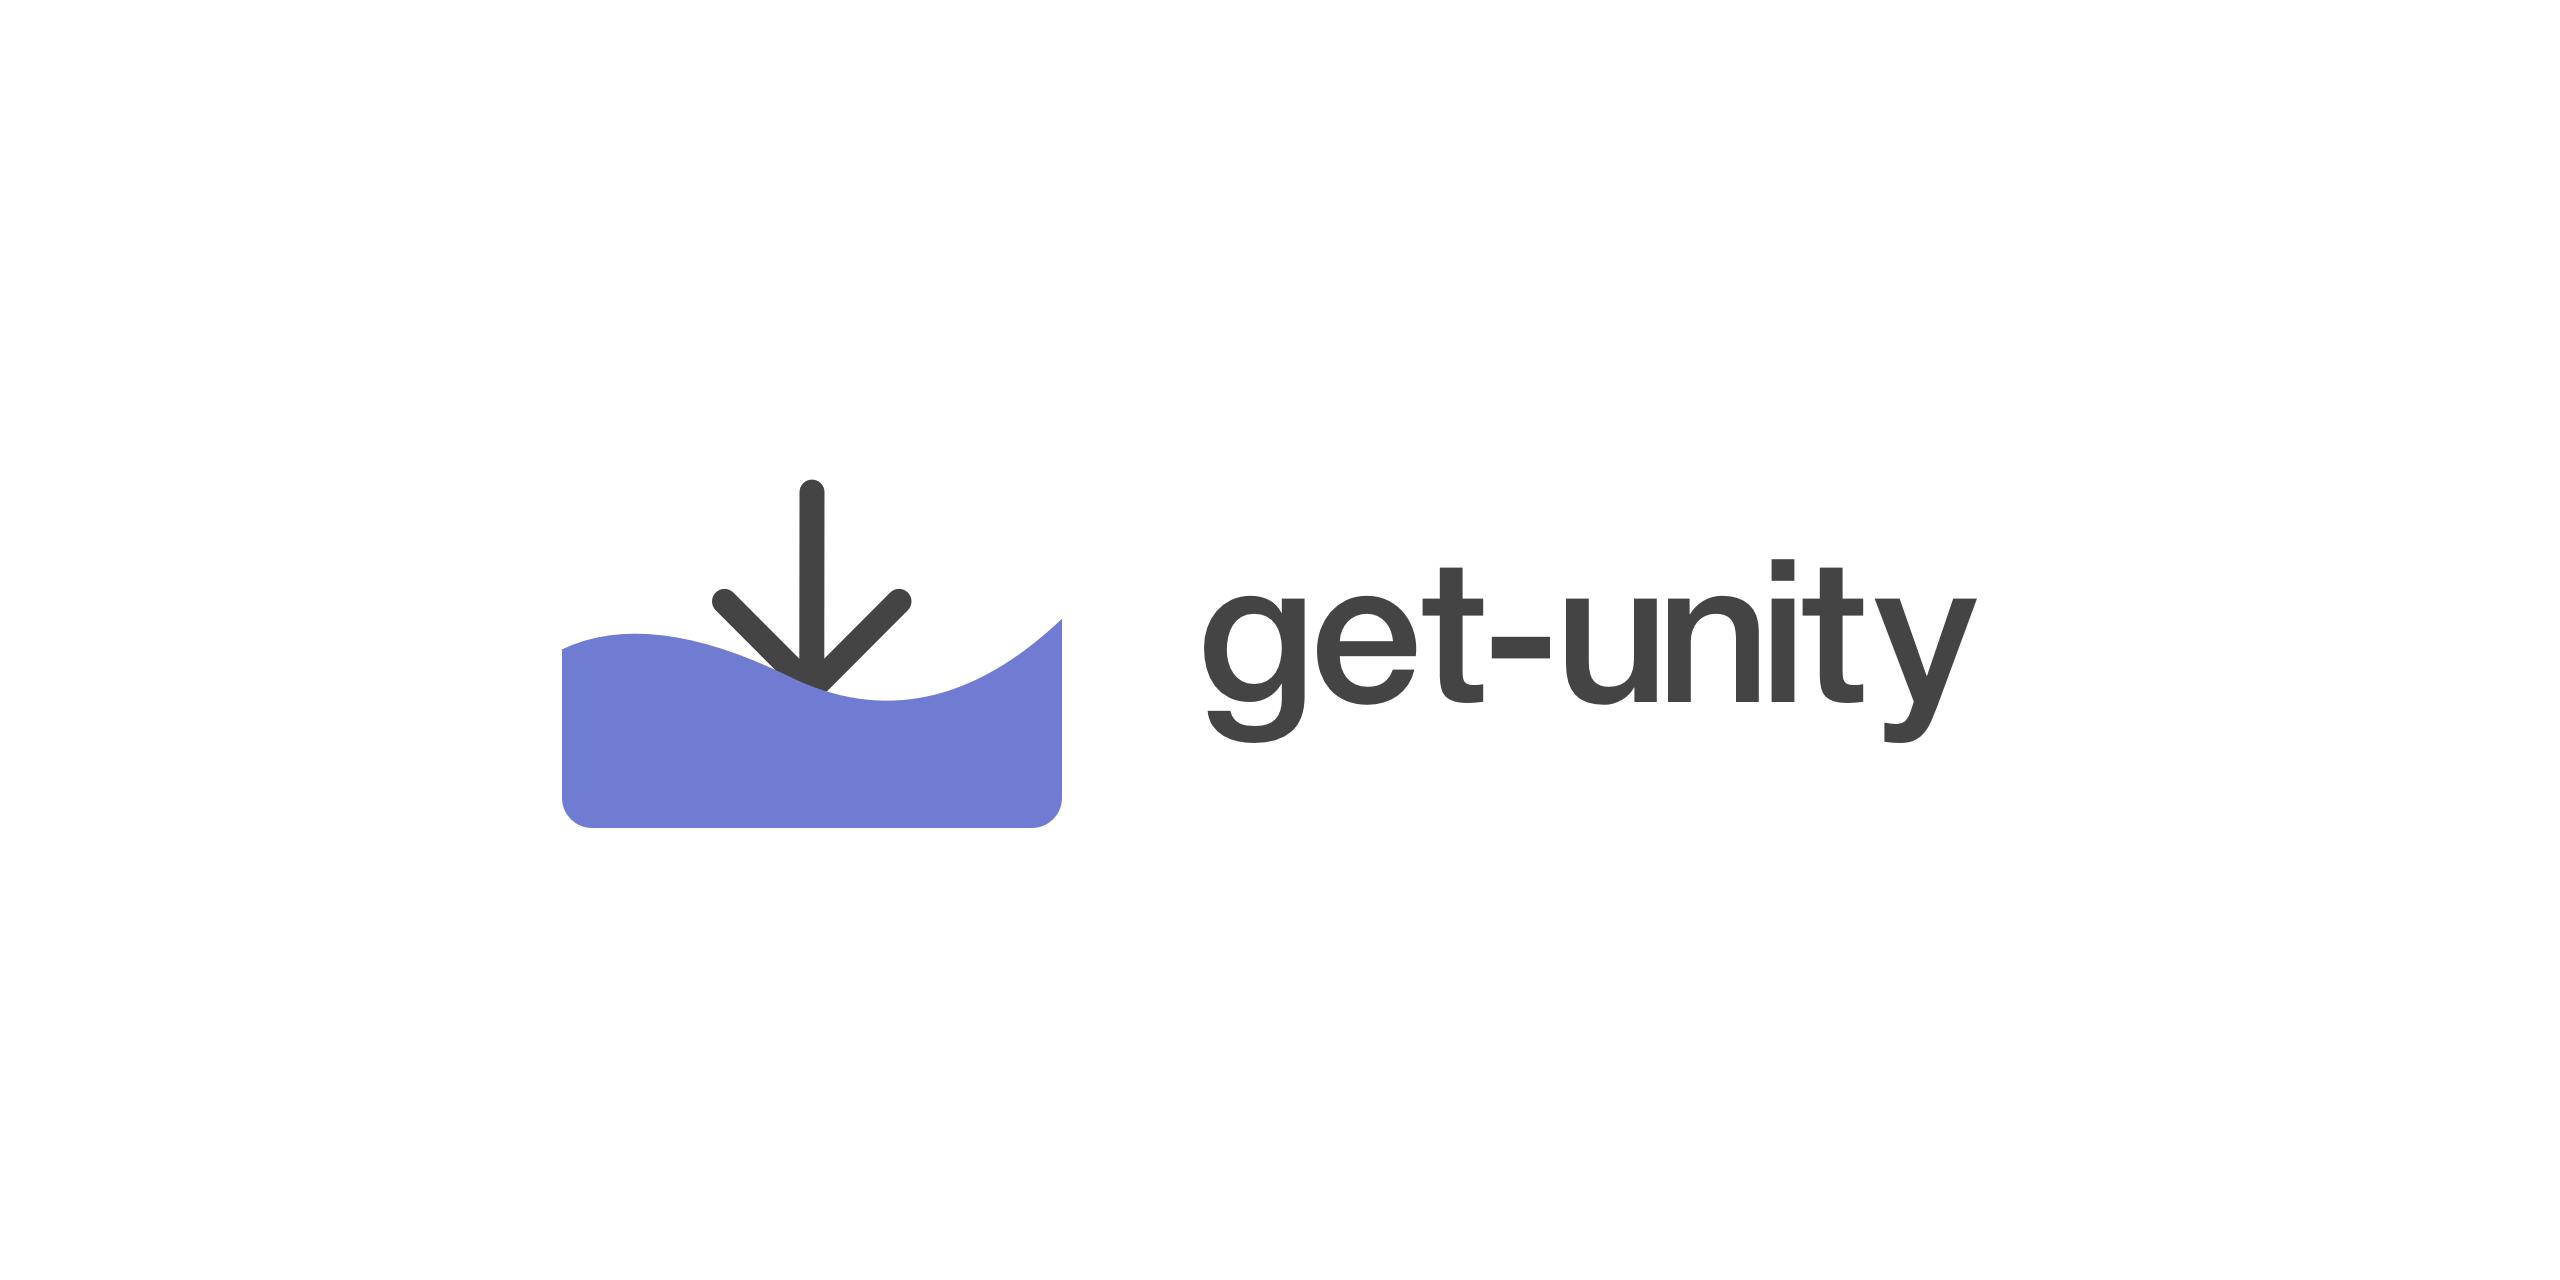 get-unity